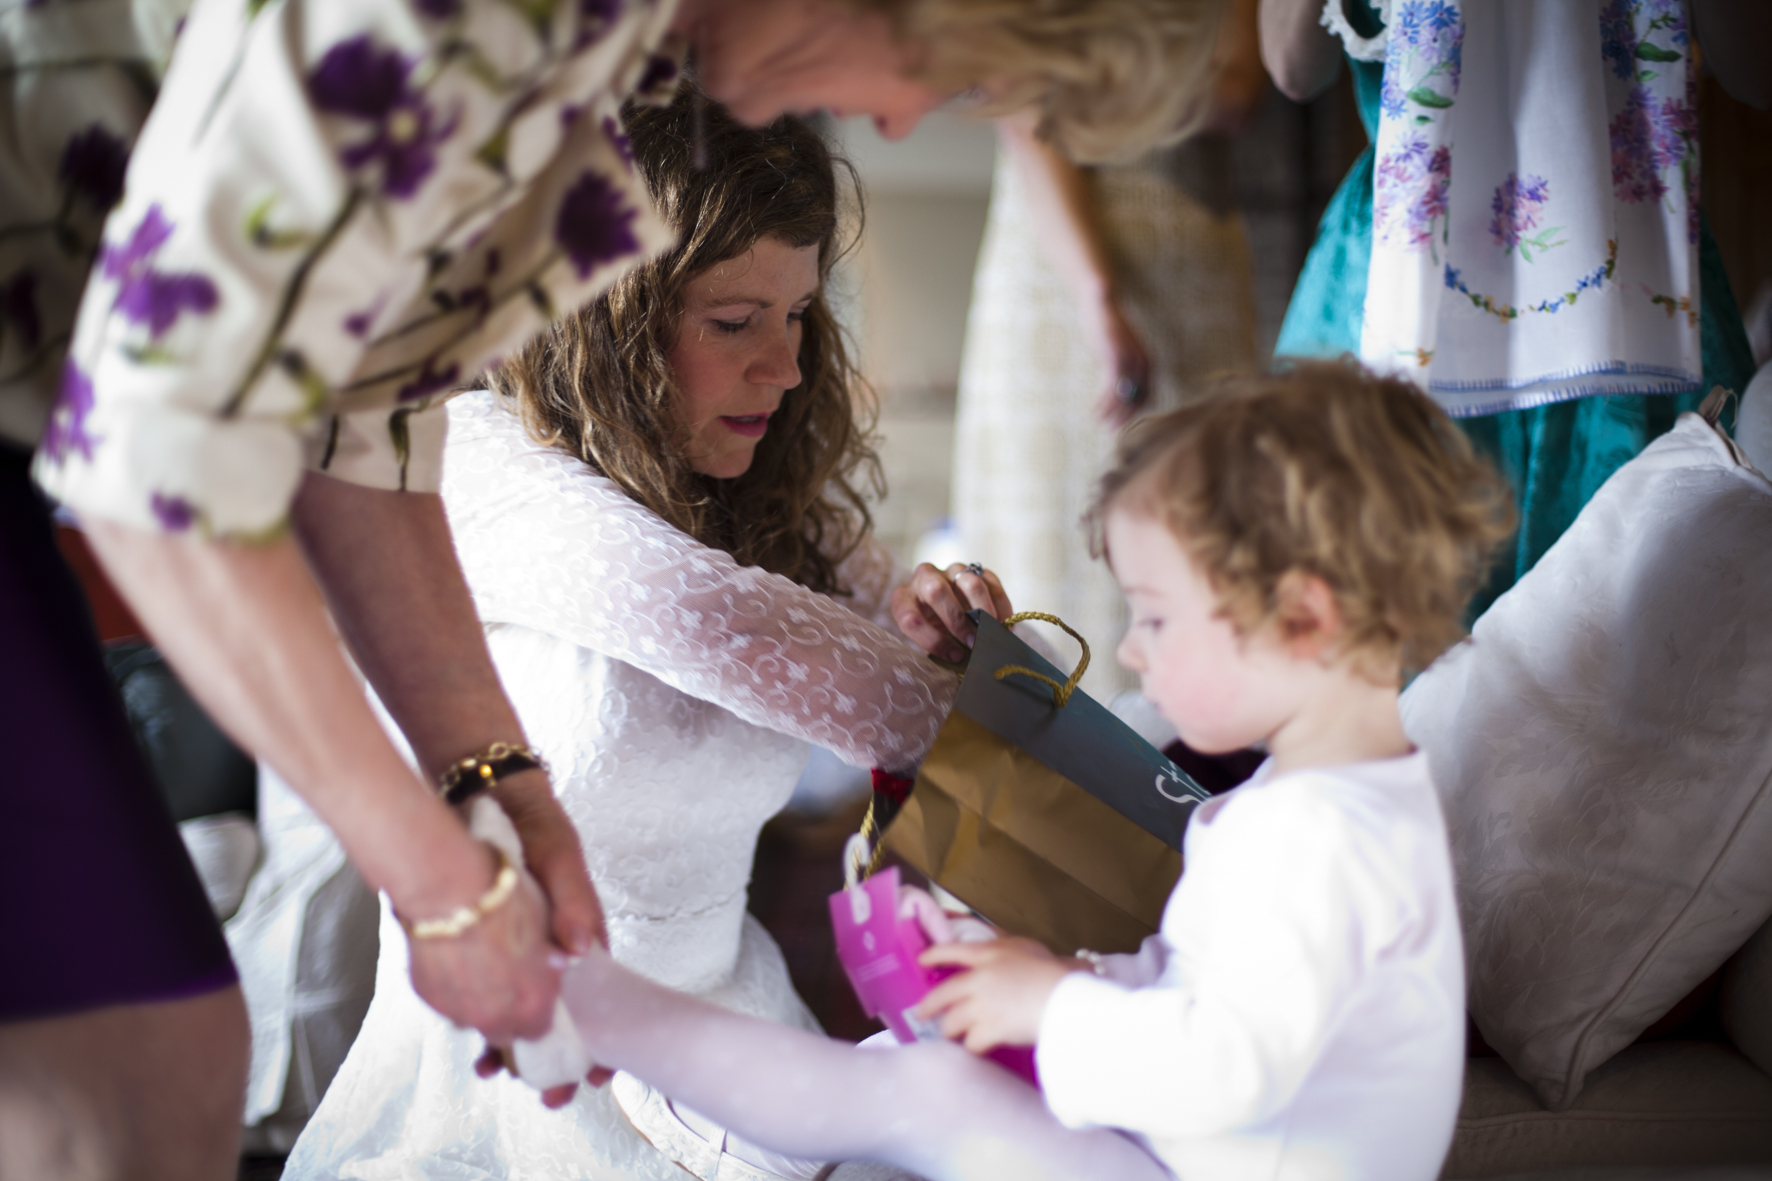 Wedding example_M&P__MG_3121_Claudia Leisinger.jpg